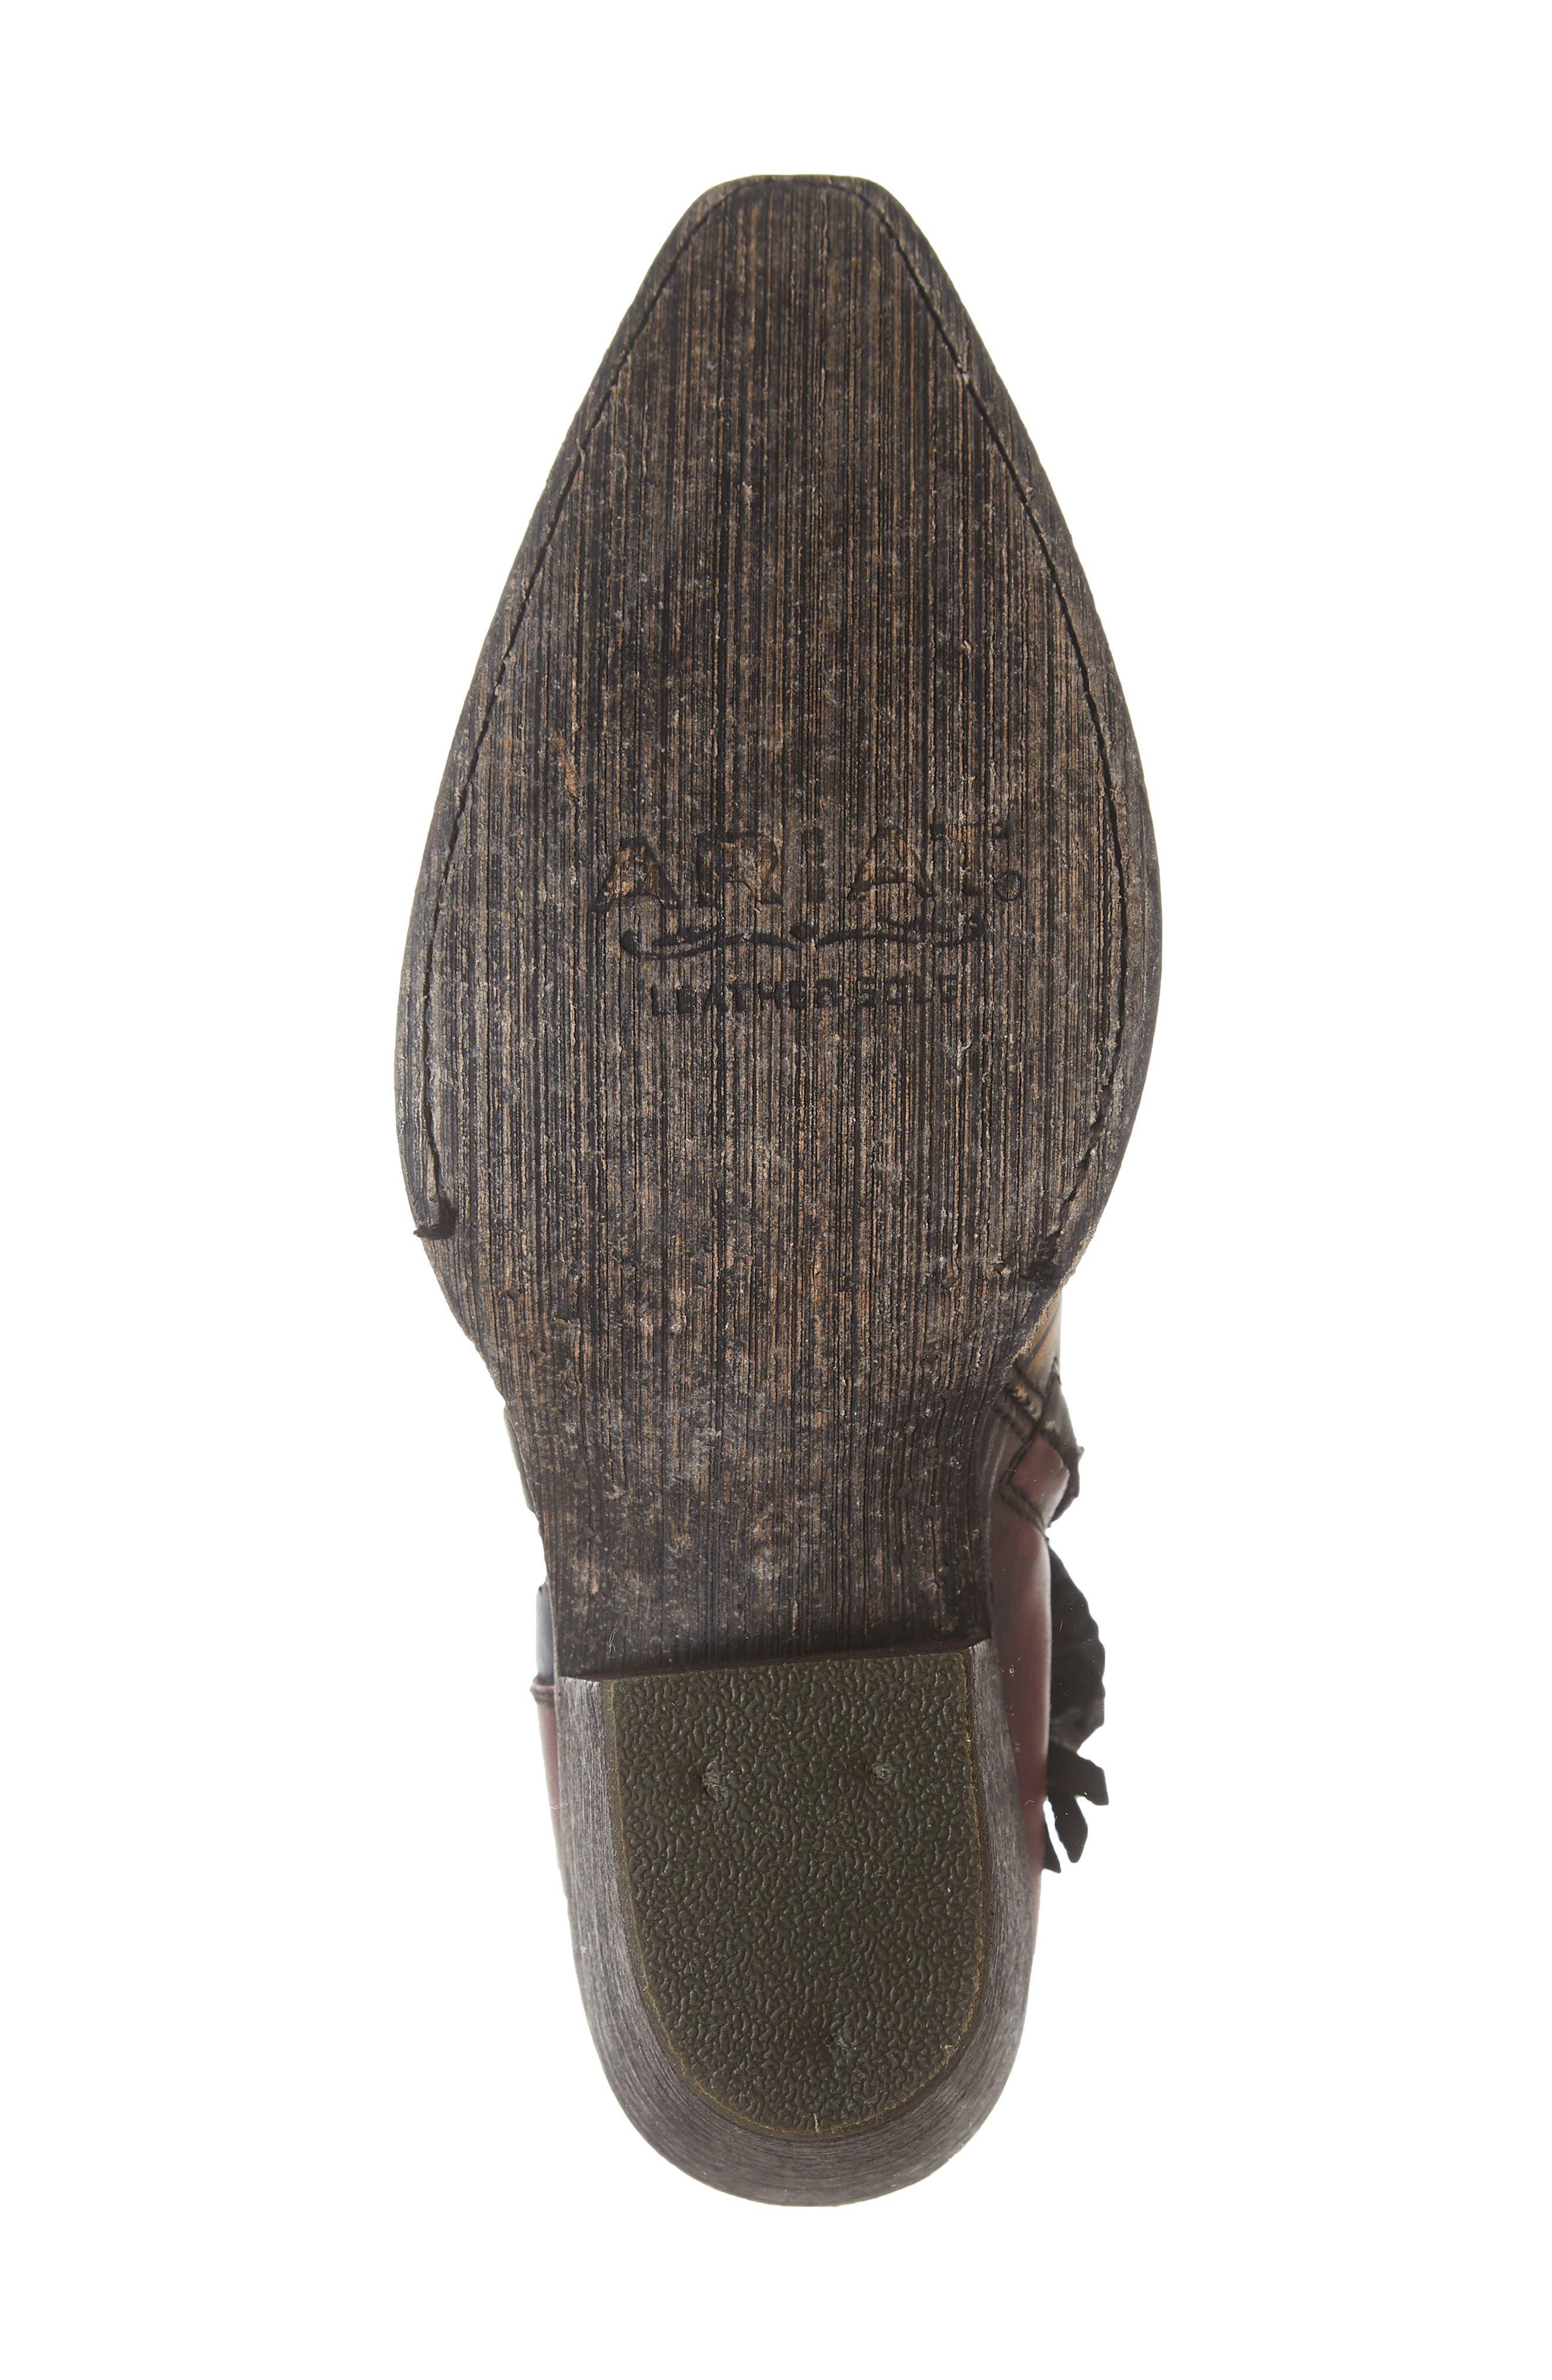 Circuit Cruz Western Boot,                             Alternate thumbnail 6, color,                             SADDLE BLANKET LEATHER